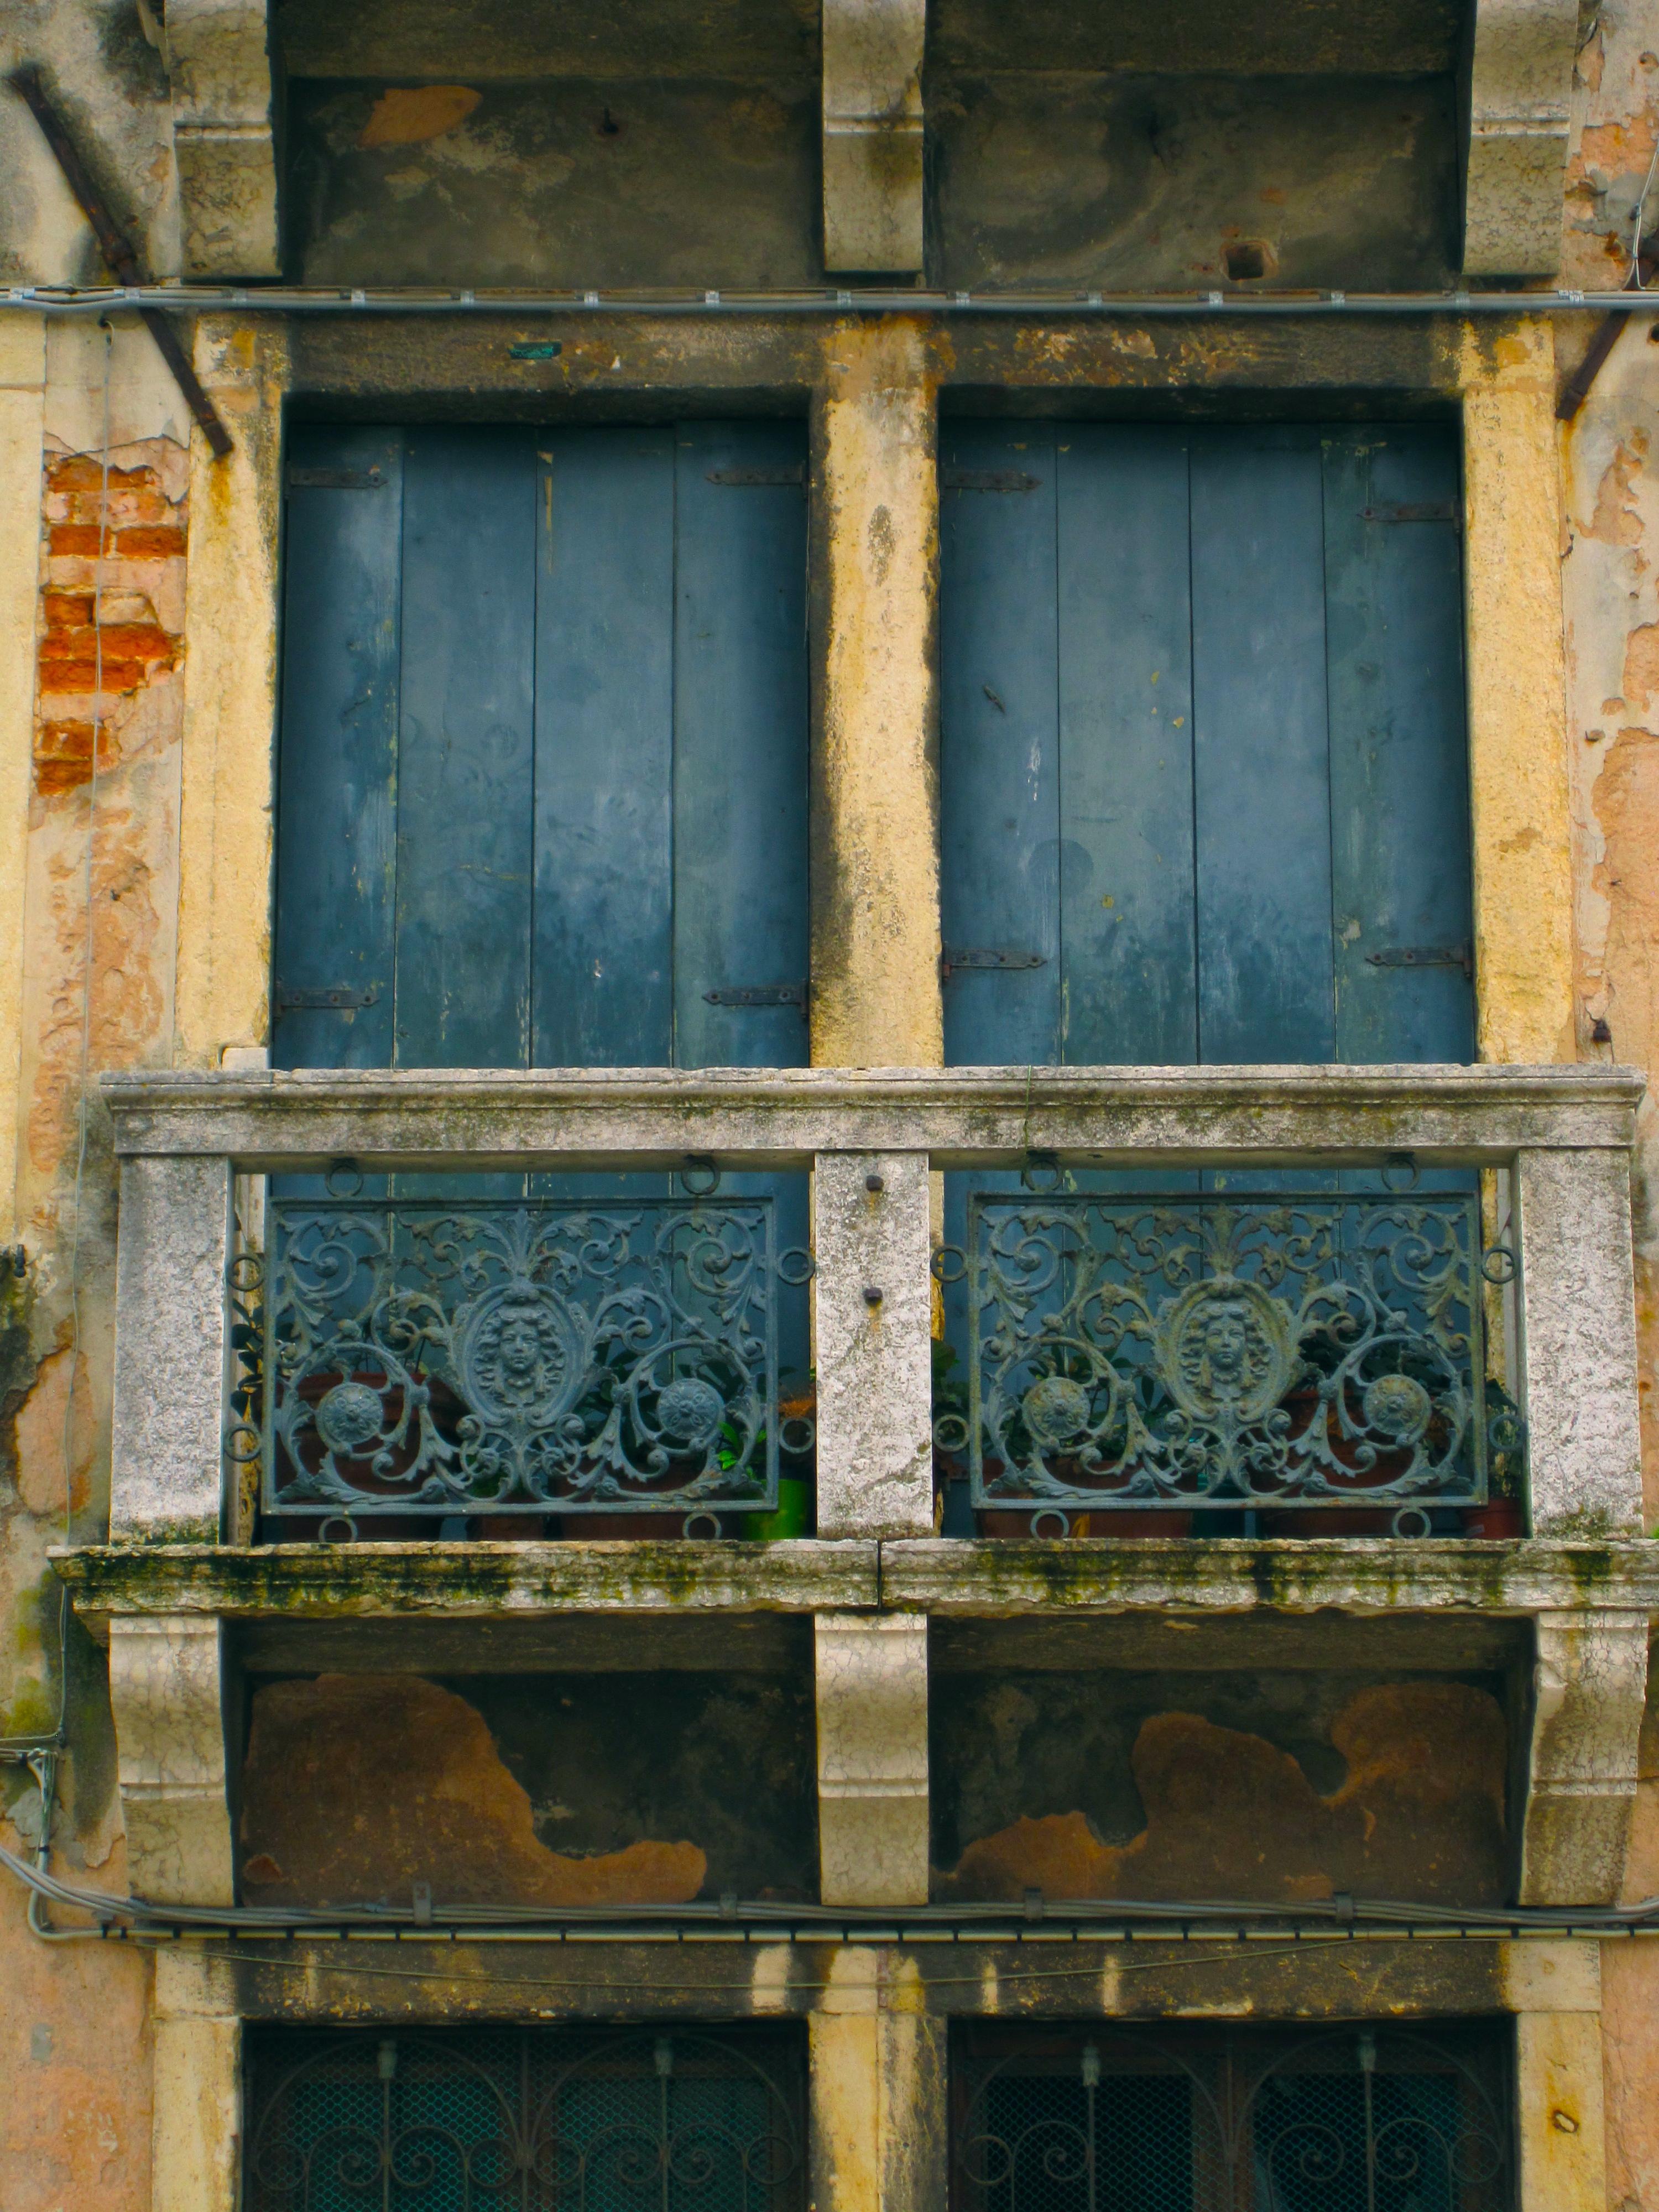 Window shutters, Santa Lucia, Venice